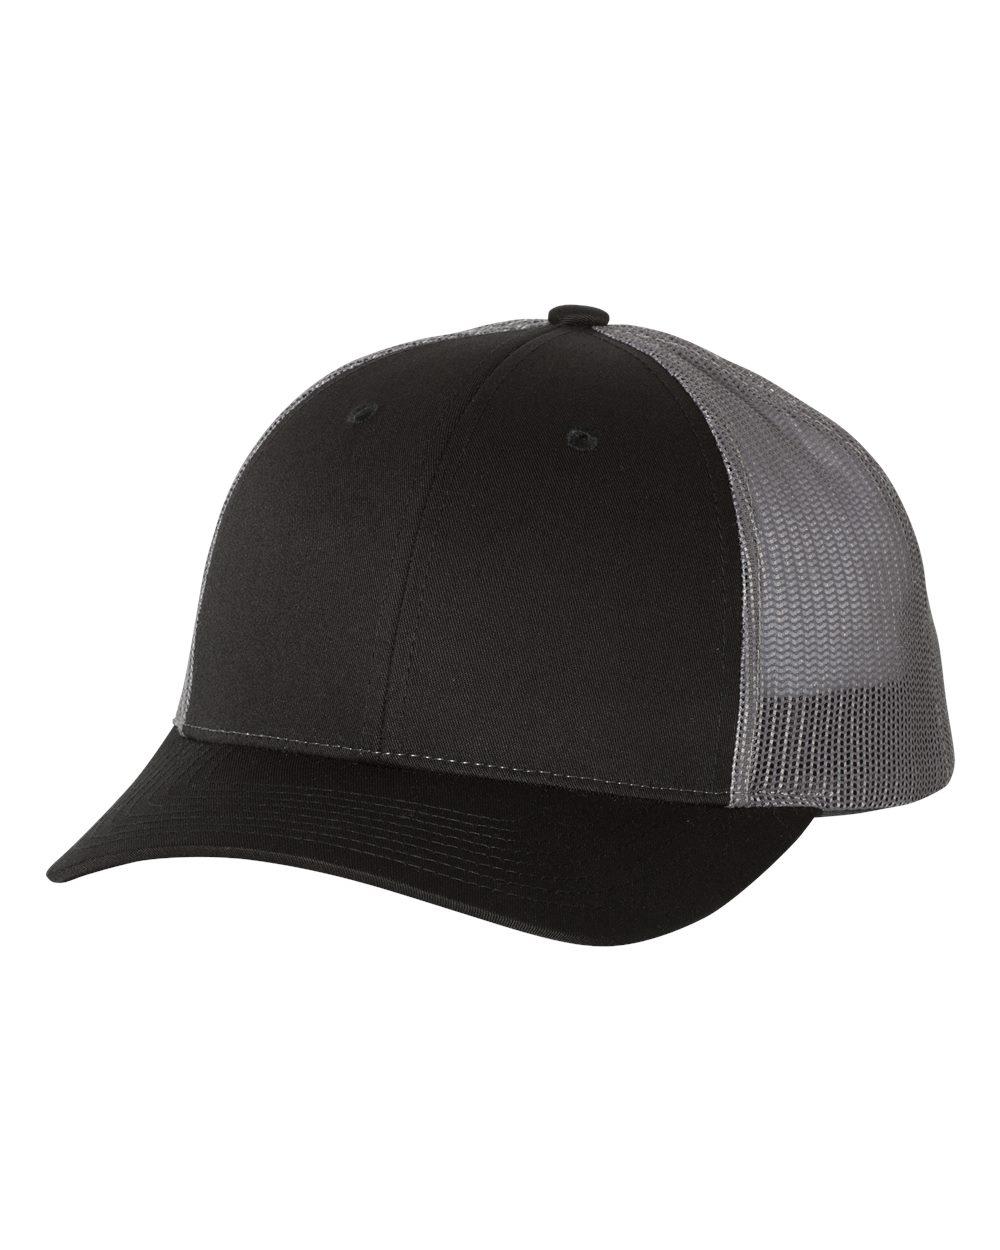 Richardson 115 - Low Profile Trucker Cap